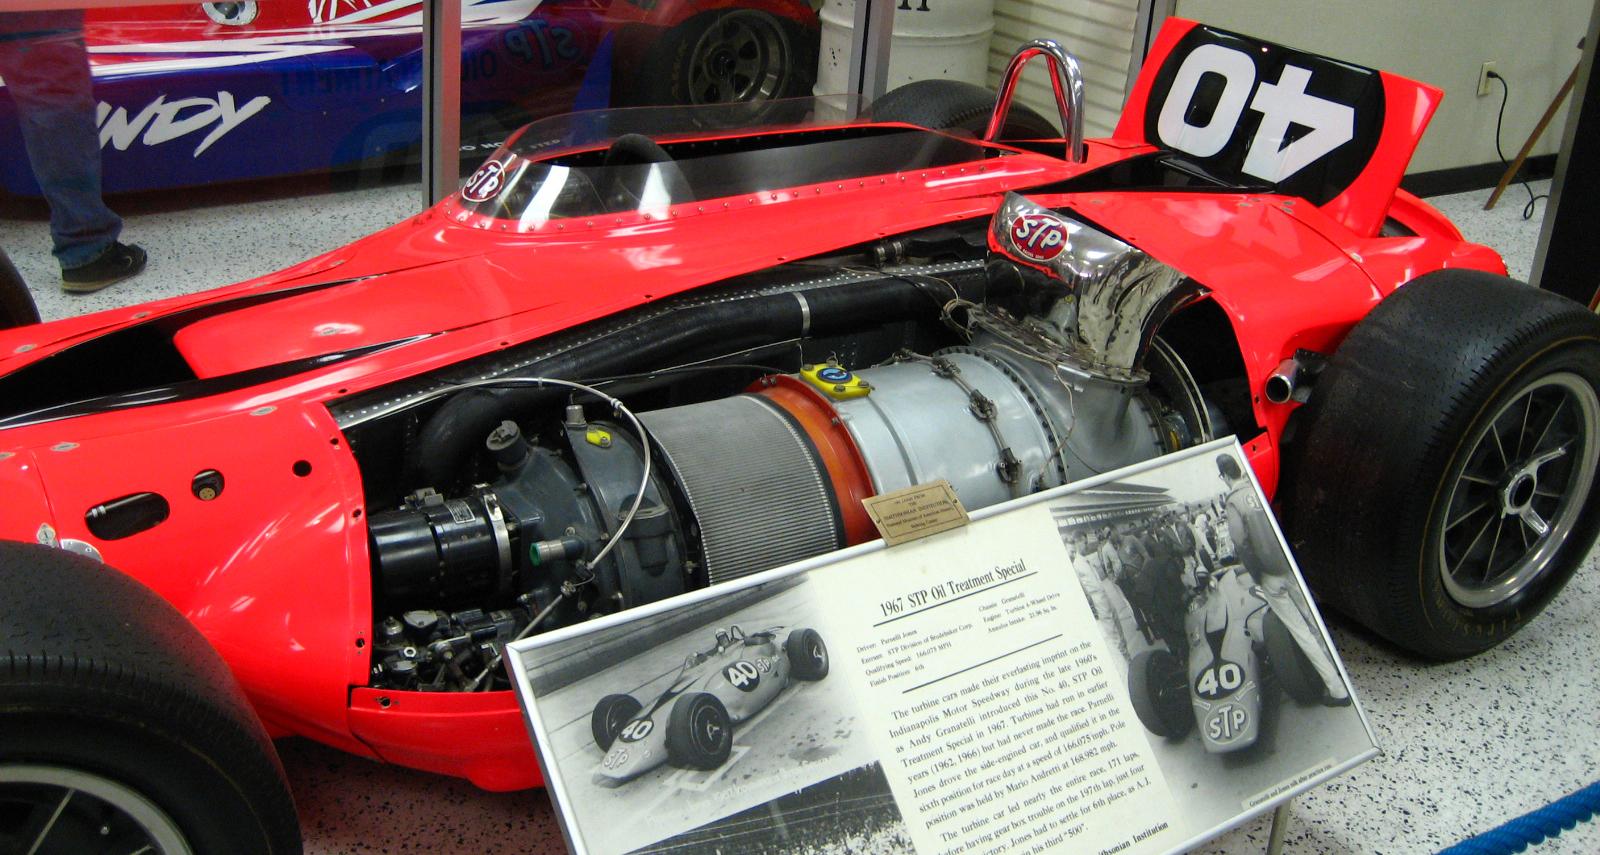 Chrysler gas turbine car